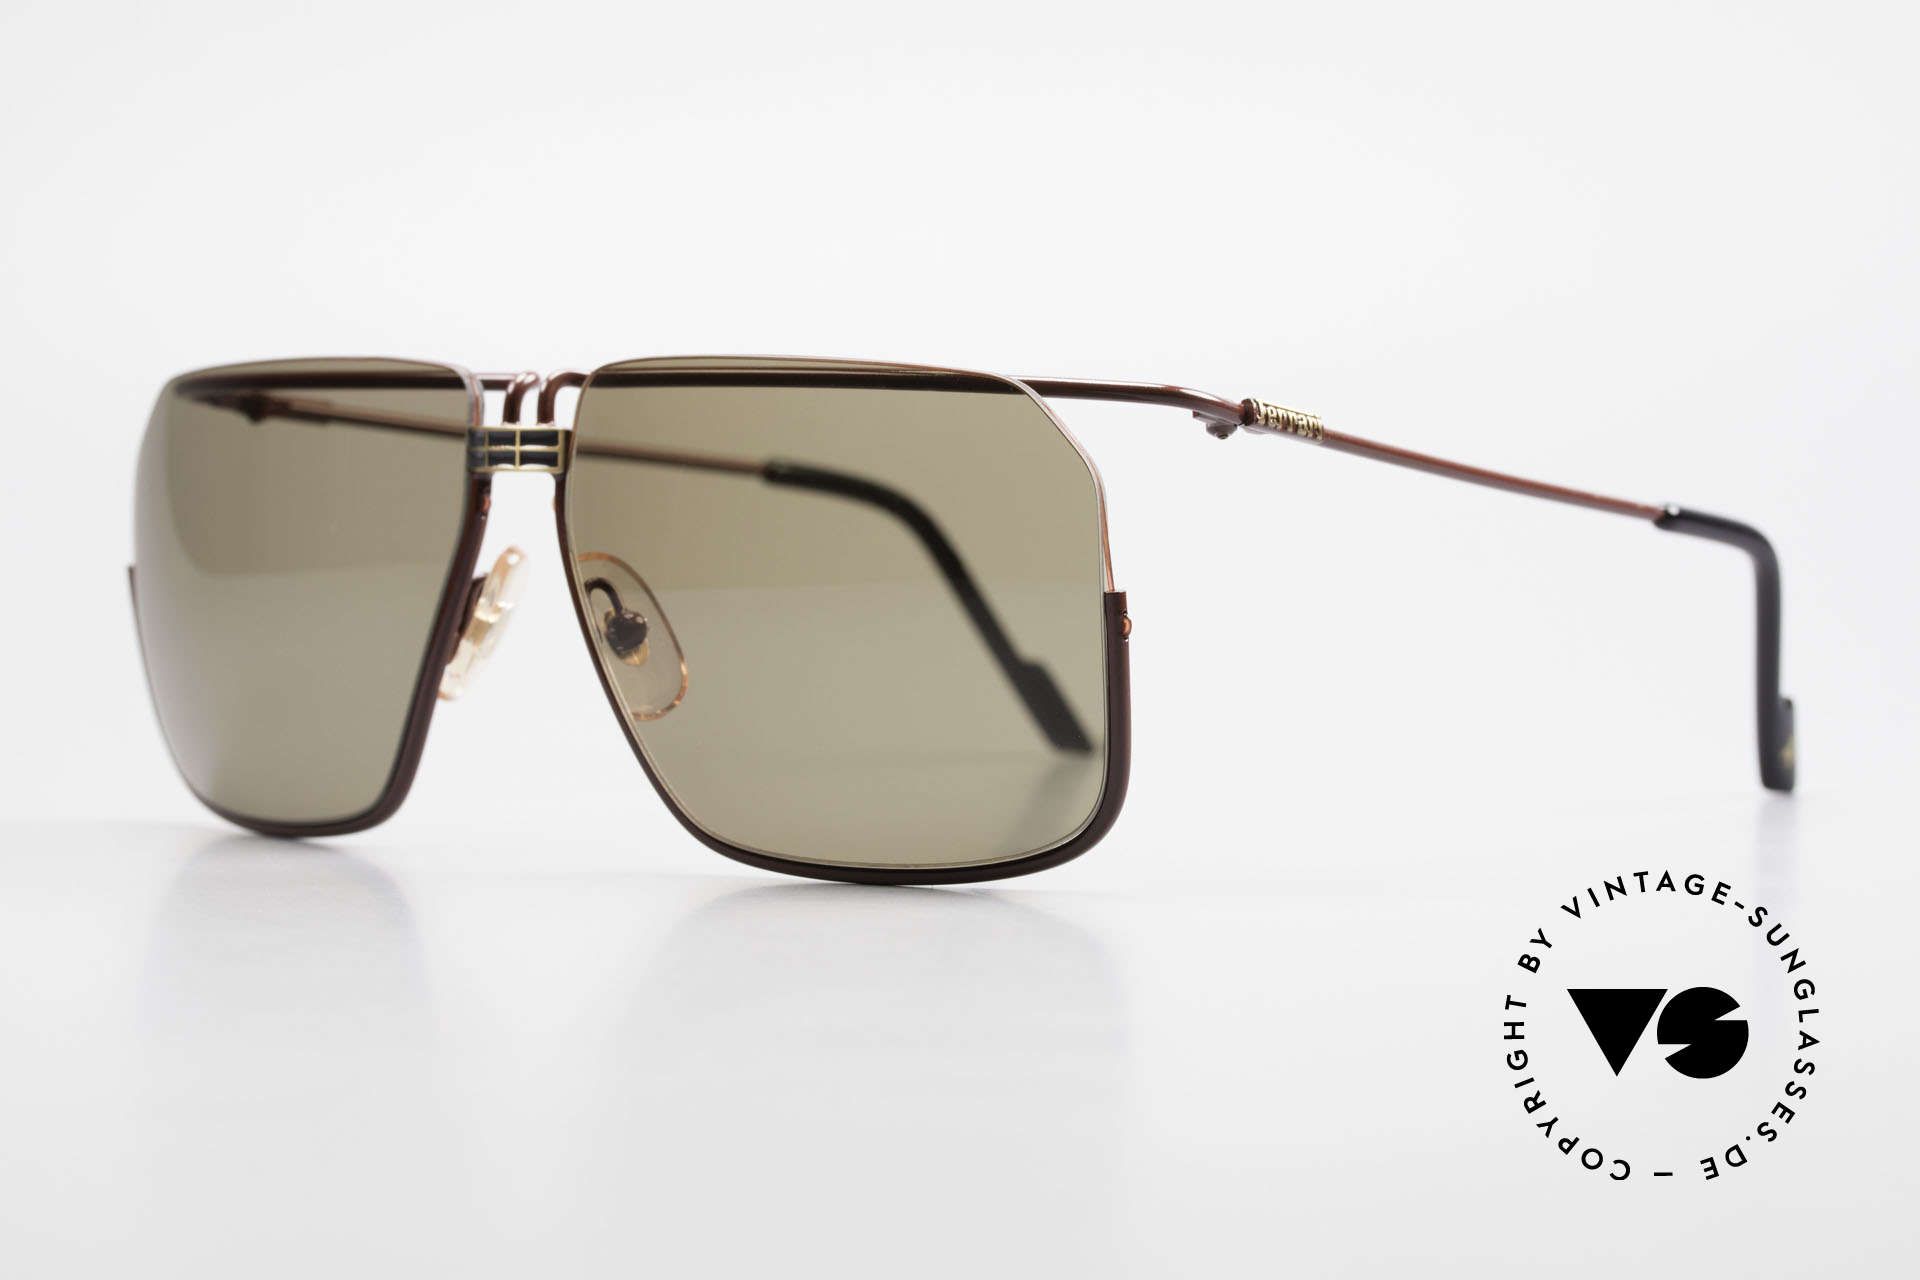 Sonnenbrillen Ferrari F18 S Ferrari Formel 1 Sonnenbrille